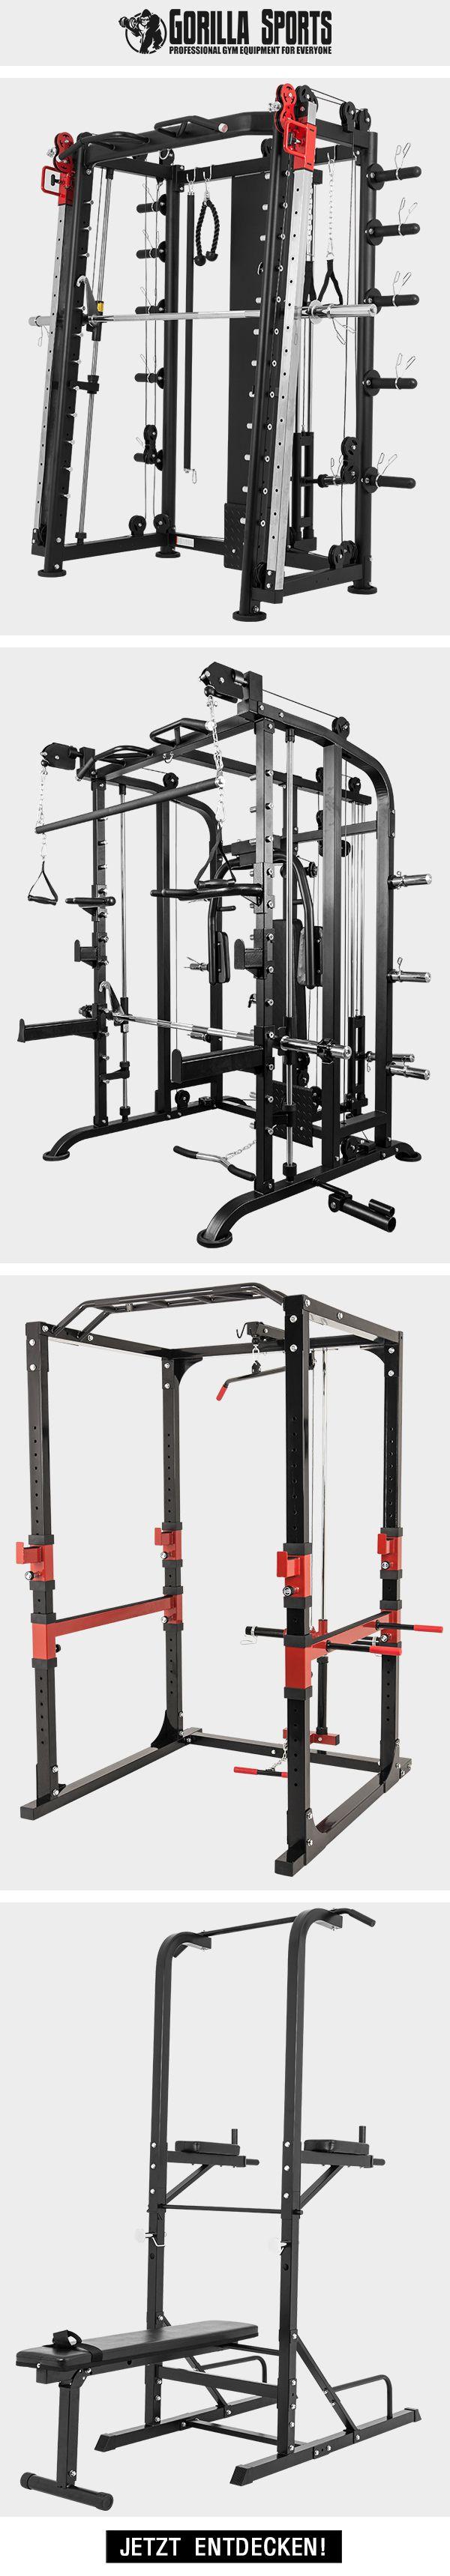 power rack gorilla sports